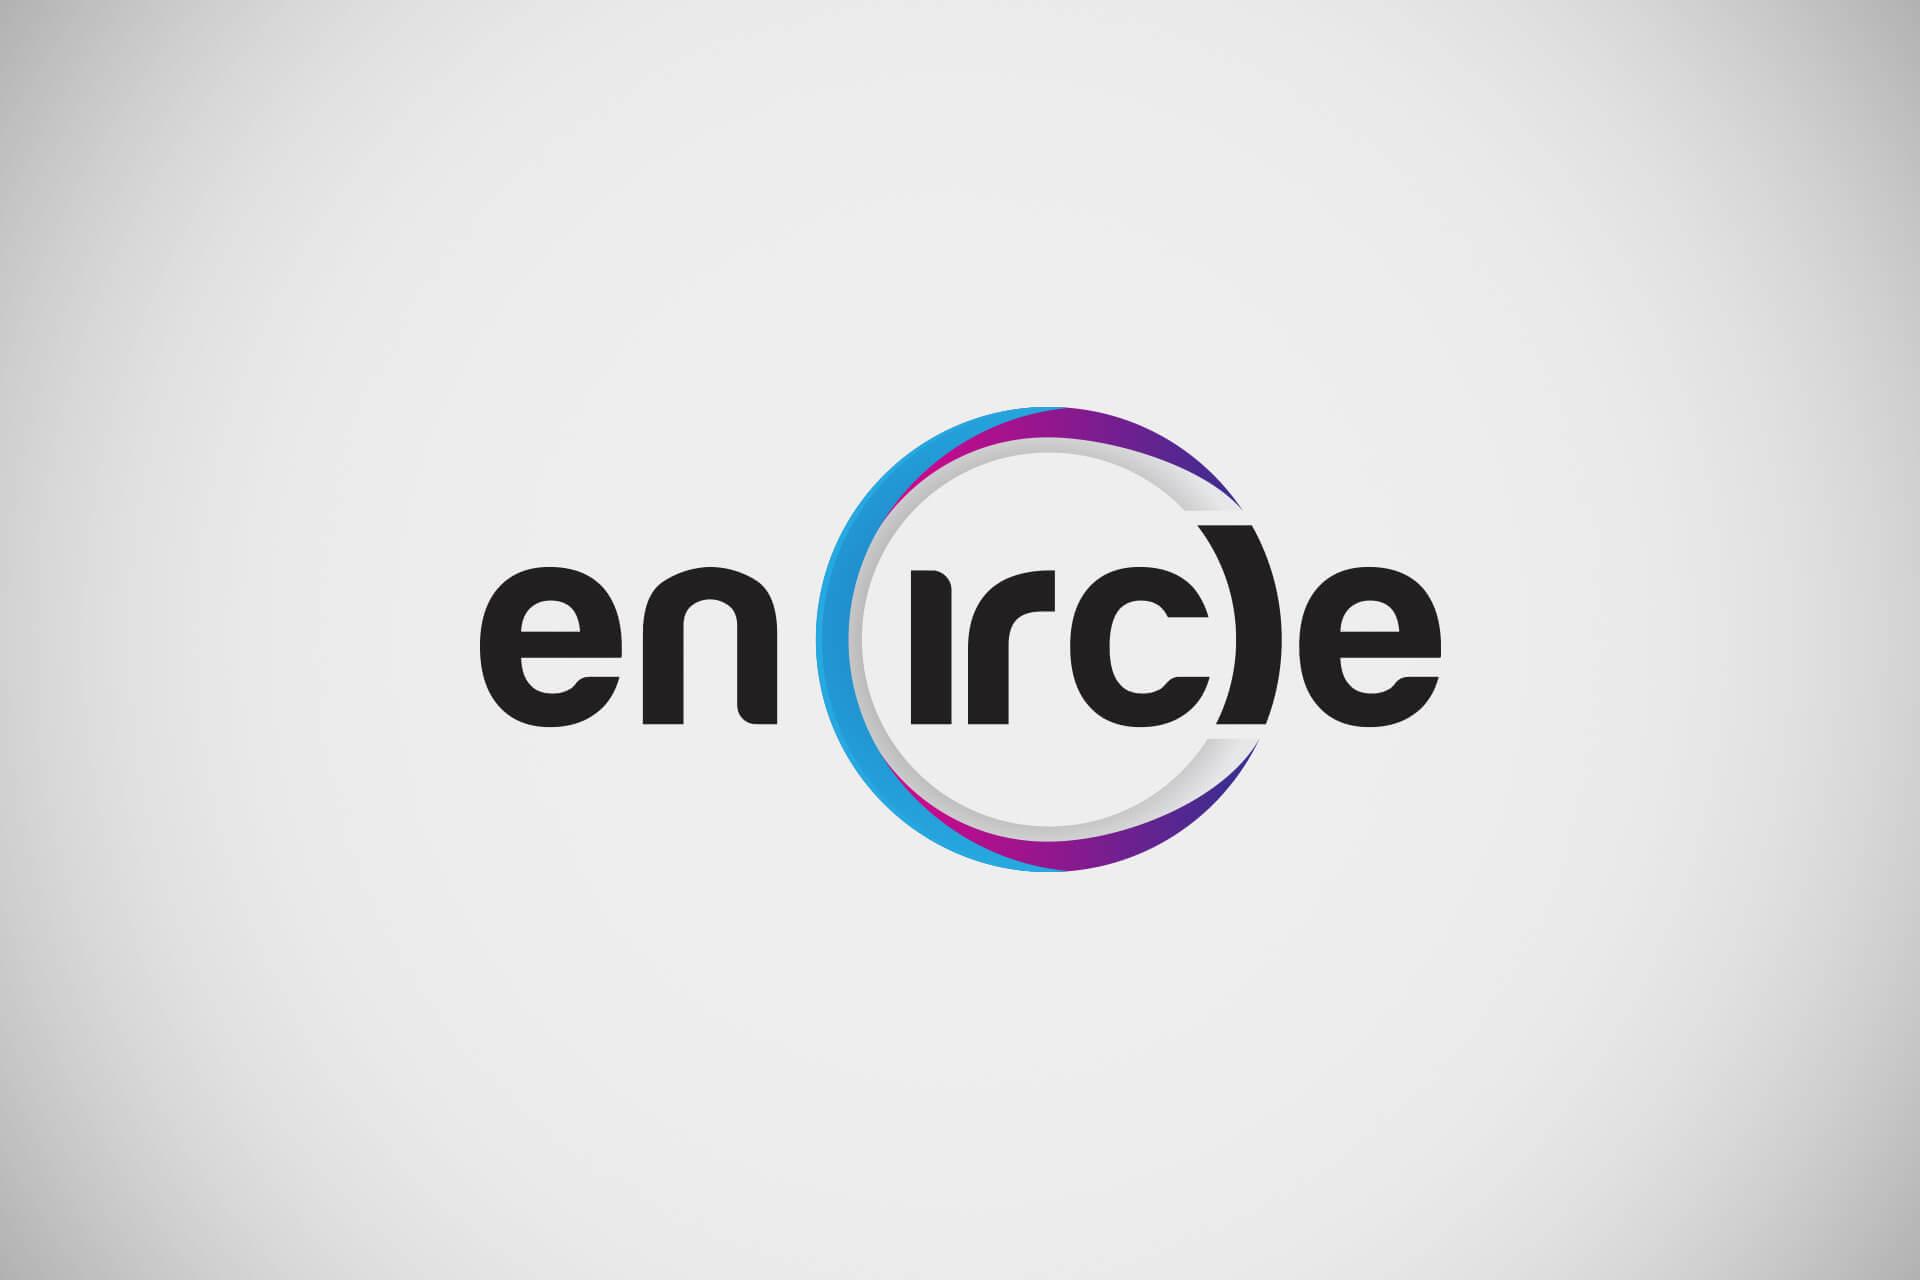 encircle_logo